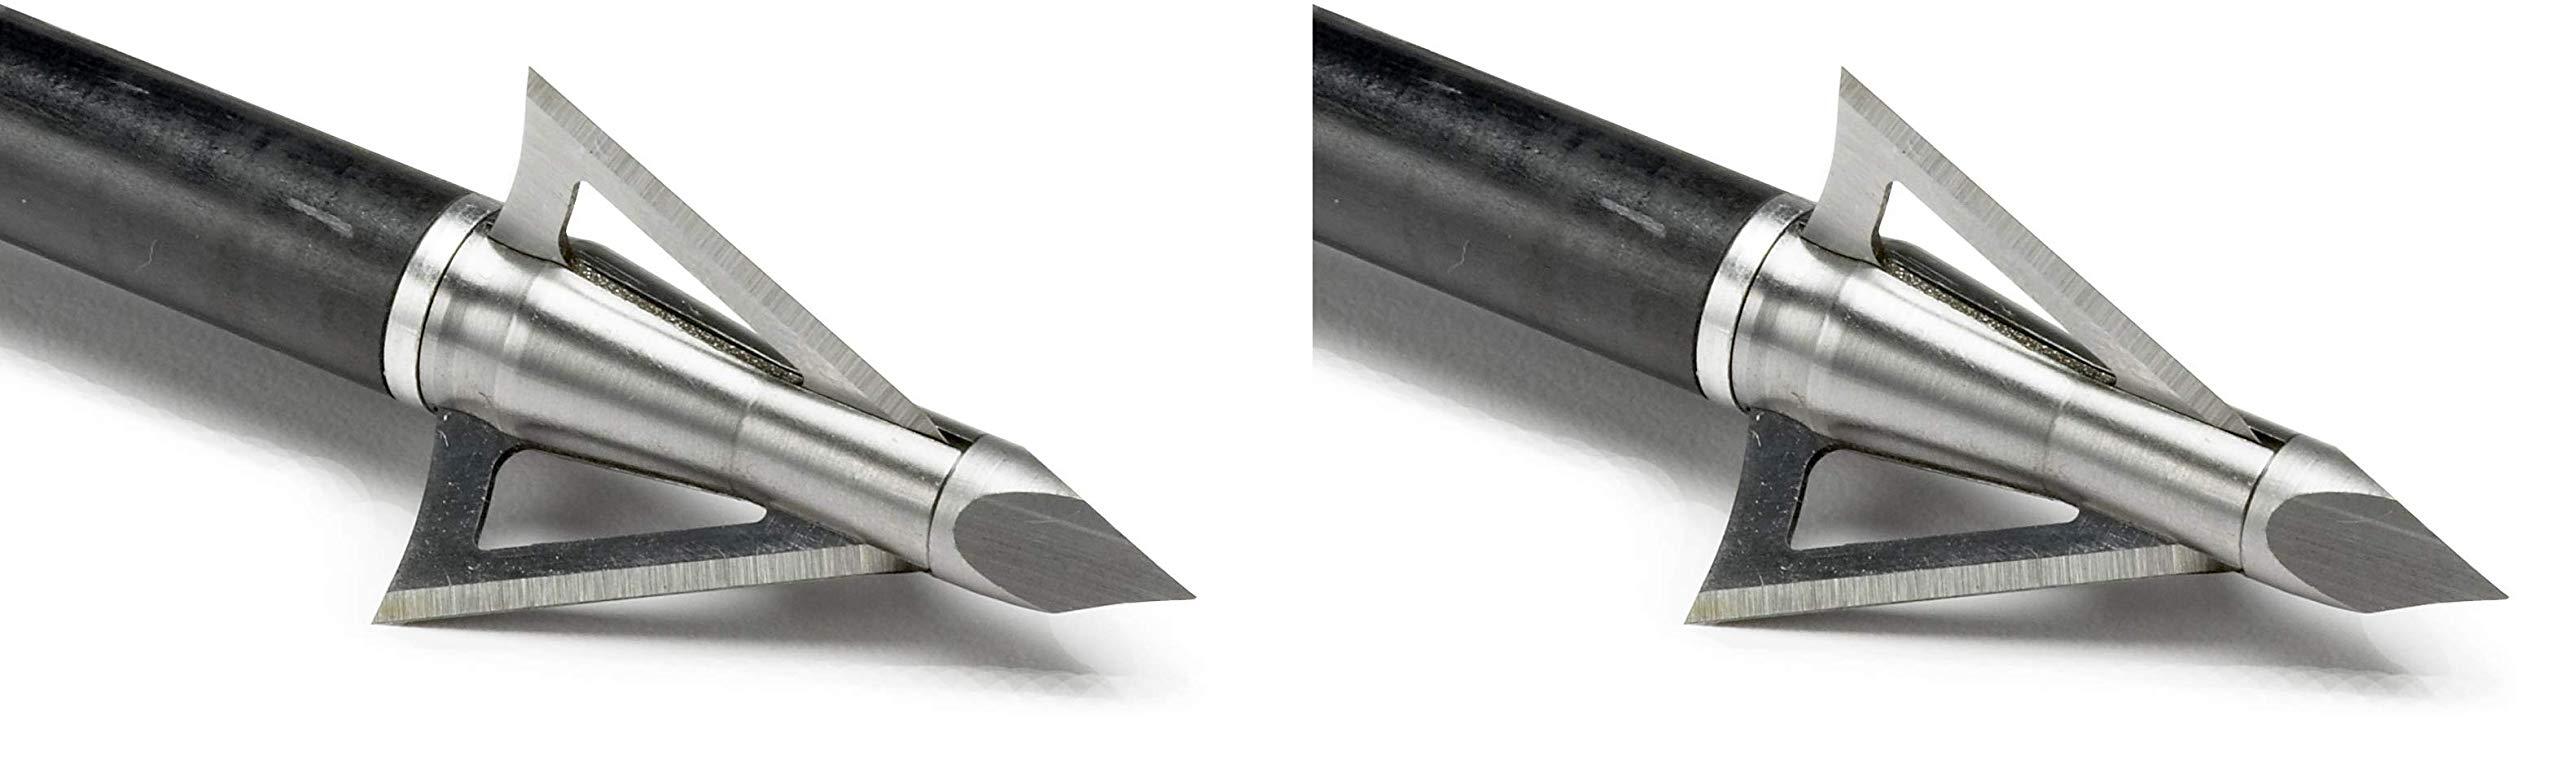 Excalibur Boltcutter 150 Grain 3-Blade Broadhead (Pack of 3) (Twо Расk)